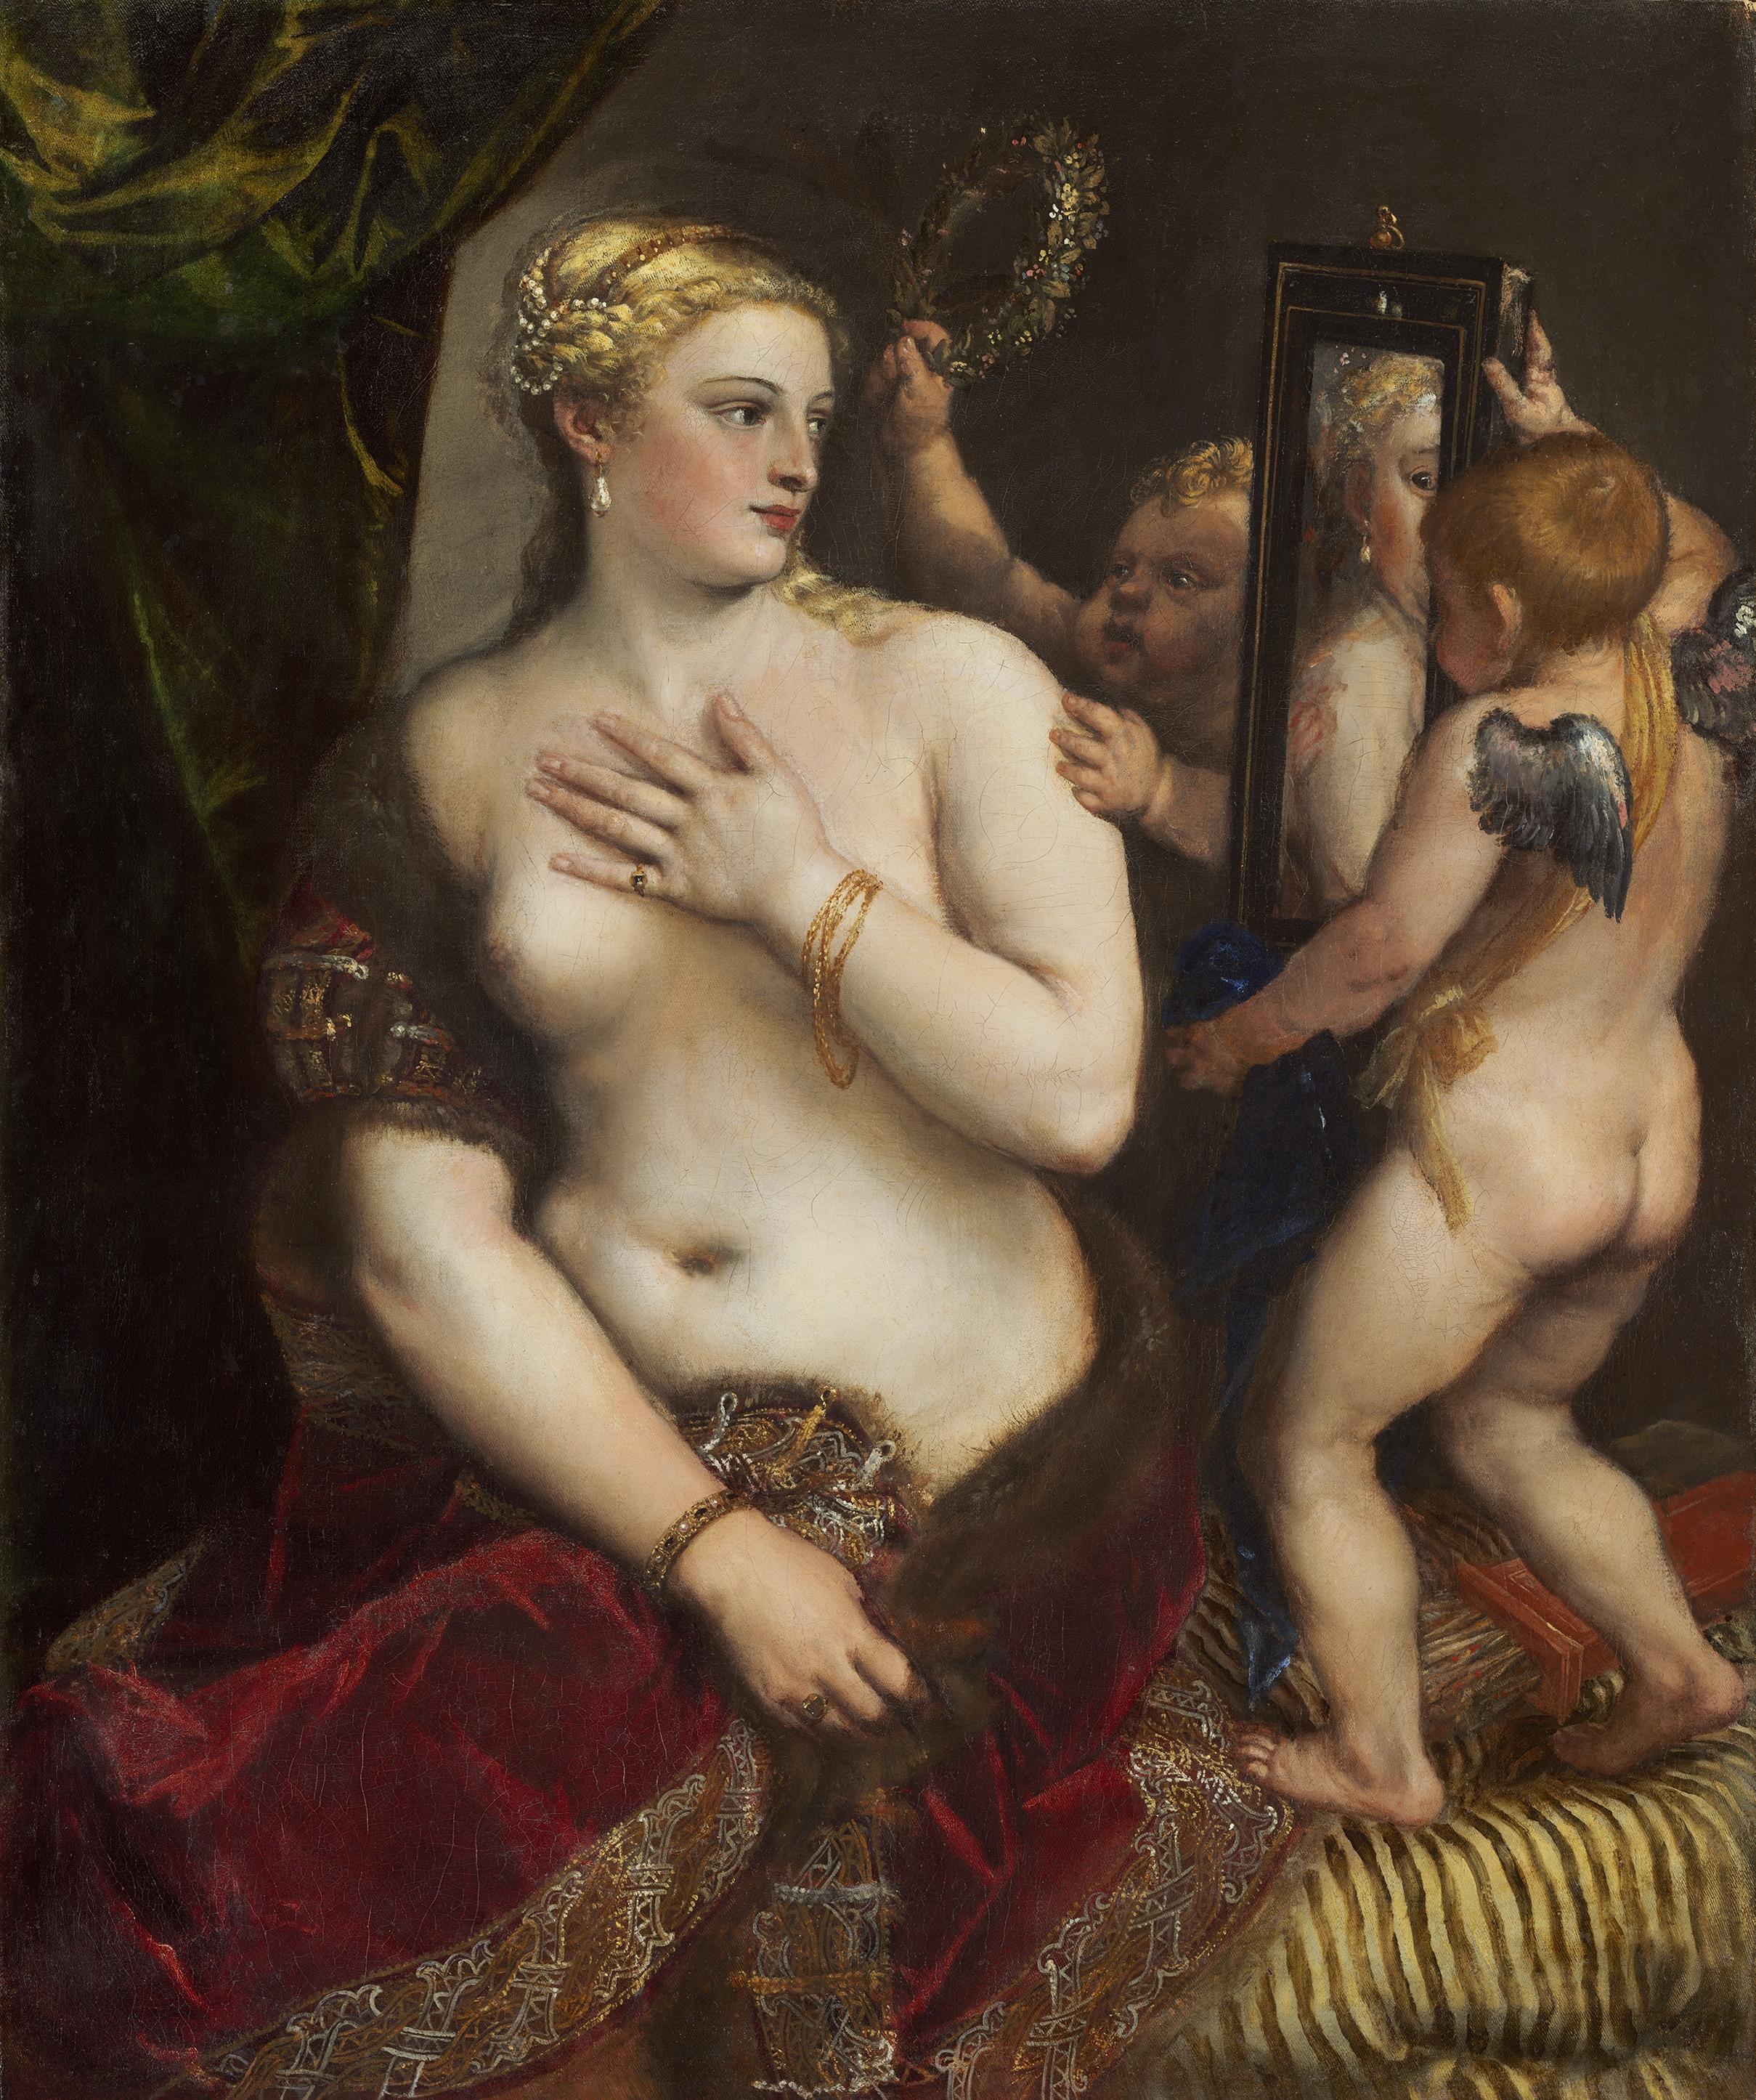 Titian Vecellio. 1488-1490 - 1576. Венера перед зеркалом. 1555. 124,5 х 105,4 см. Вашингтон, Национальная галерея